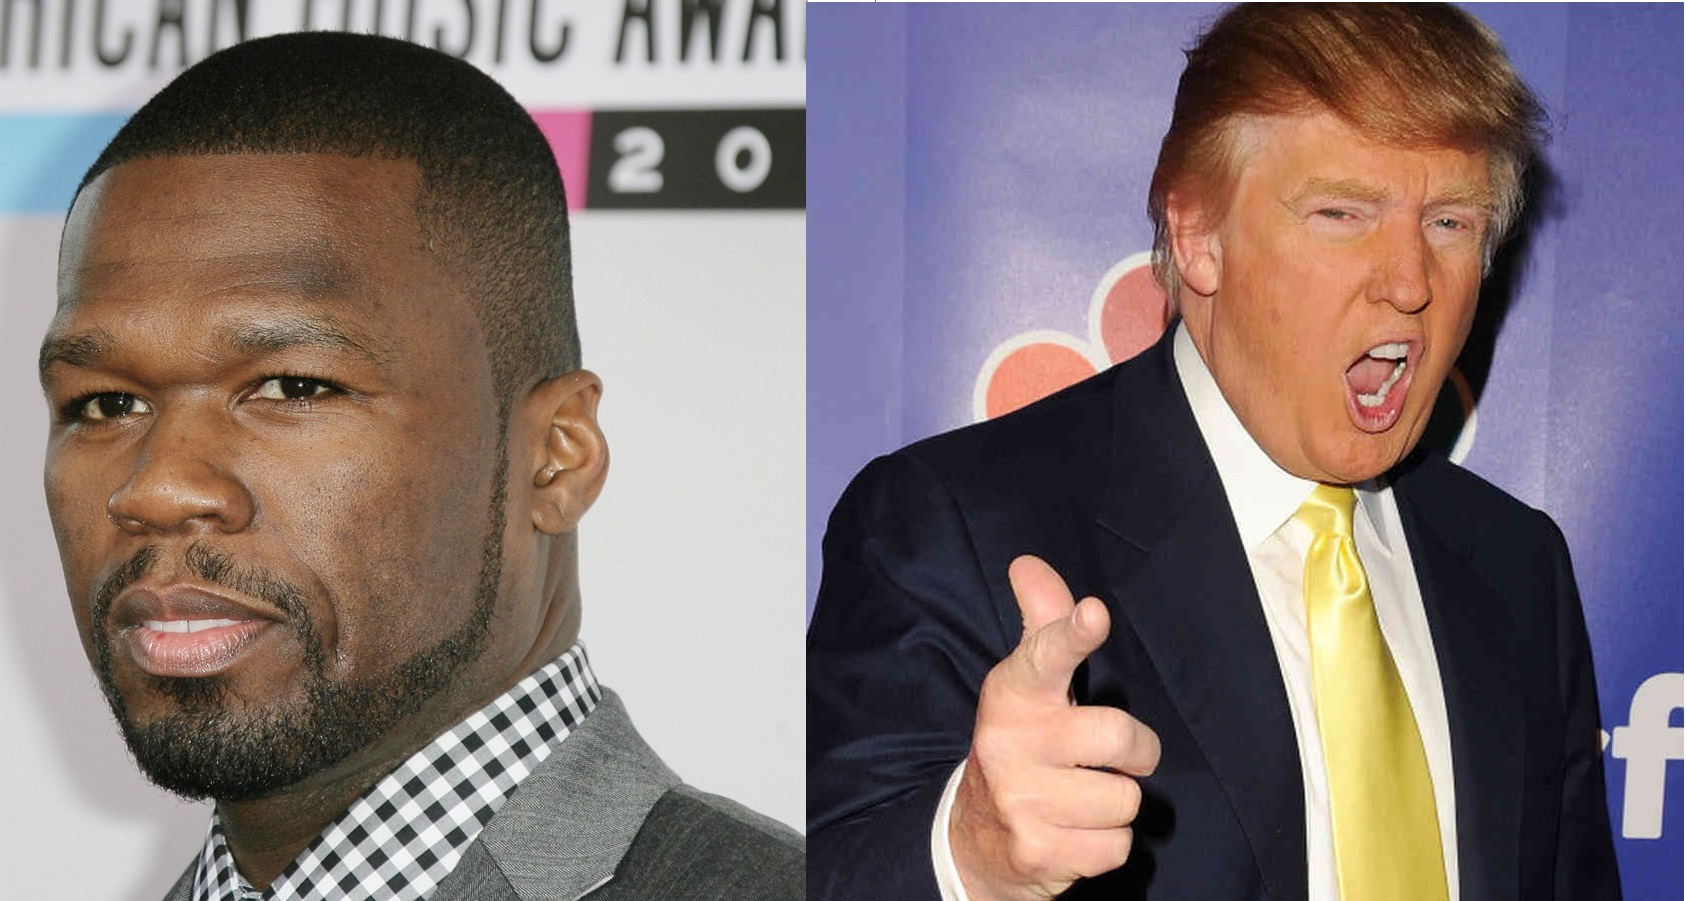 Donald Trump - Celebrity Bankruptcies - Bank Choices